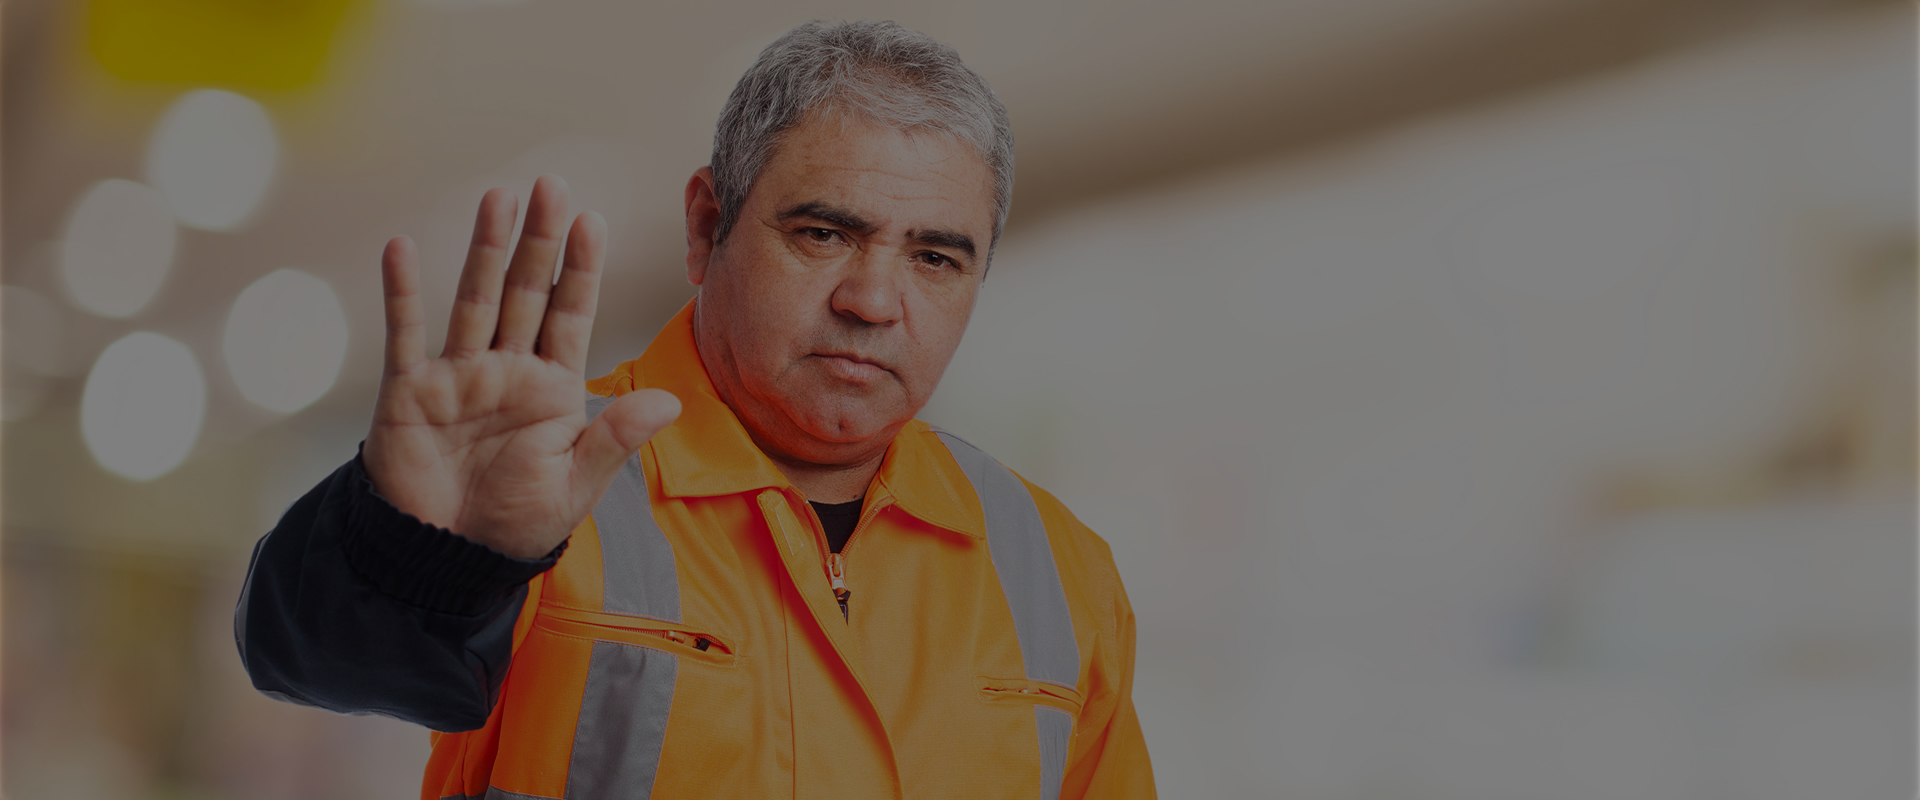 Si eres consultor en protección civil, bombero, paramédico o ingeniero industrial…